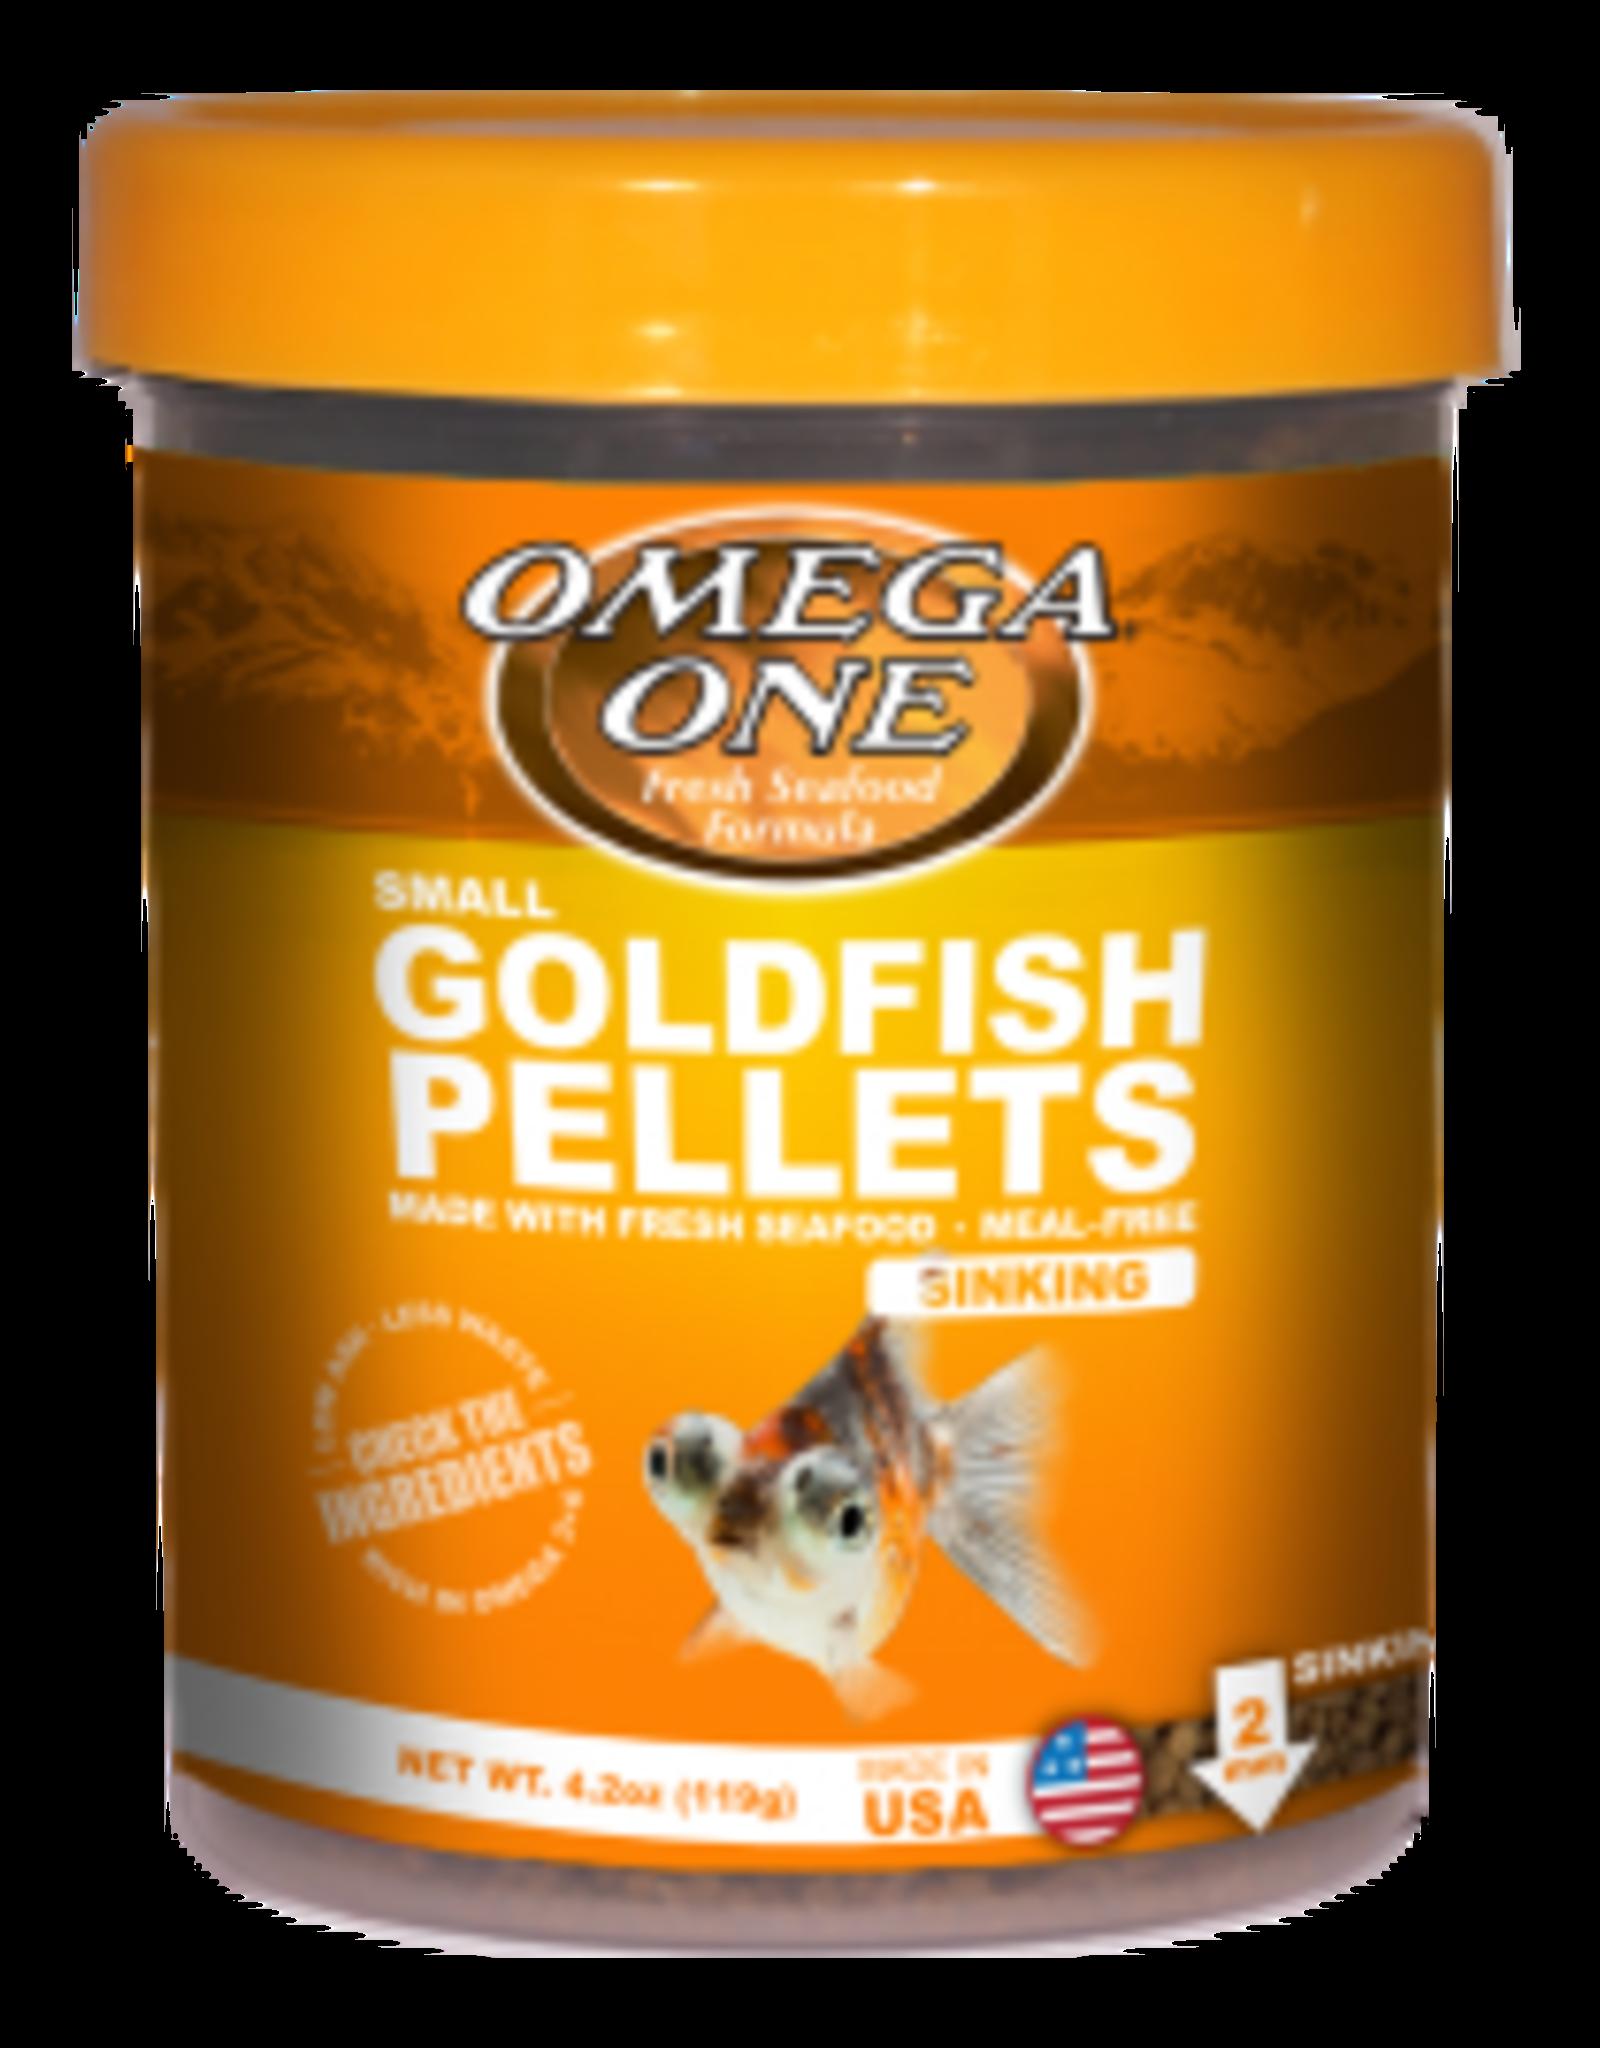 Goldfish Pellets Small 8oz